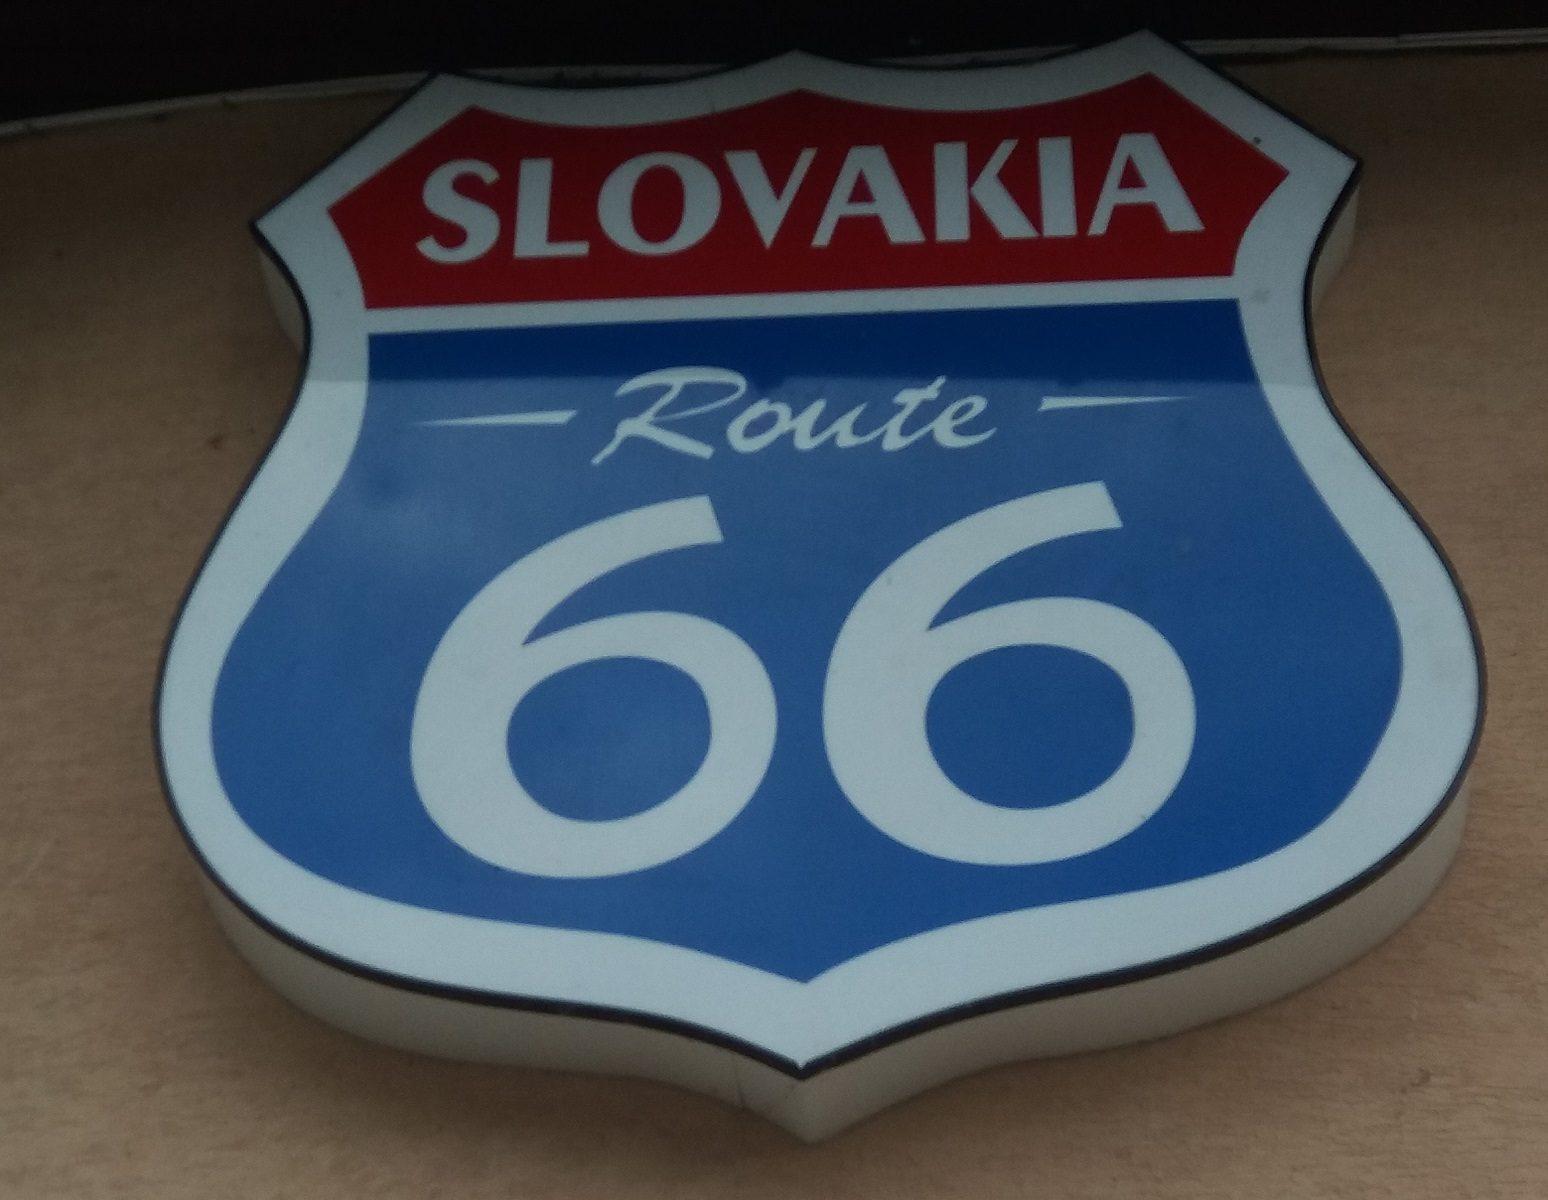 Slovakia Route 66 - Mustangom Cabrio